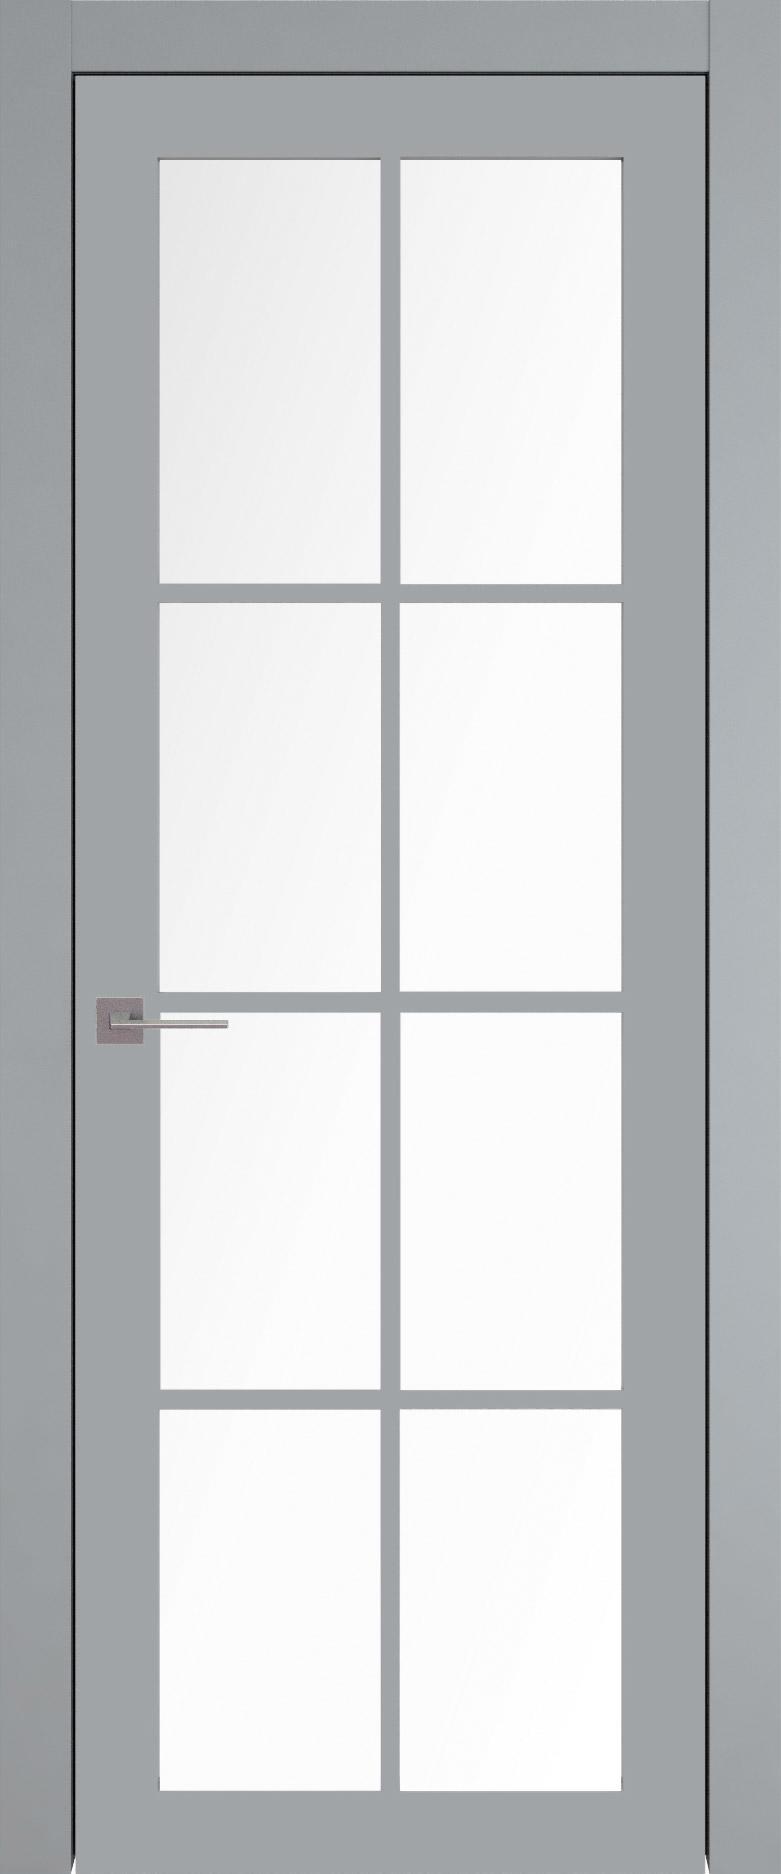 Tivoli З-5 цвет - Серебристо-серая эмаль (RAL 7045) Со стеклом (ДО)